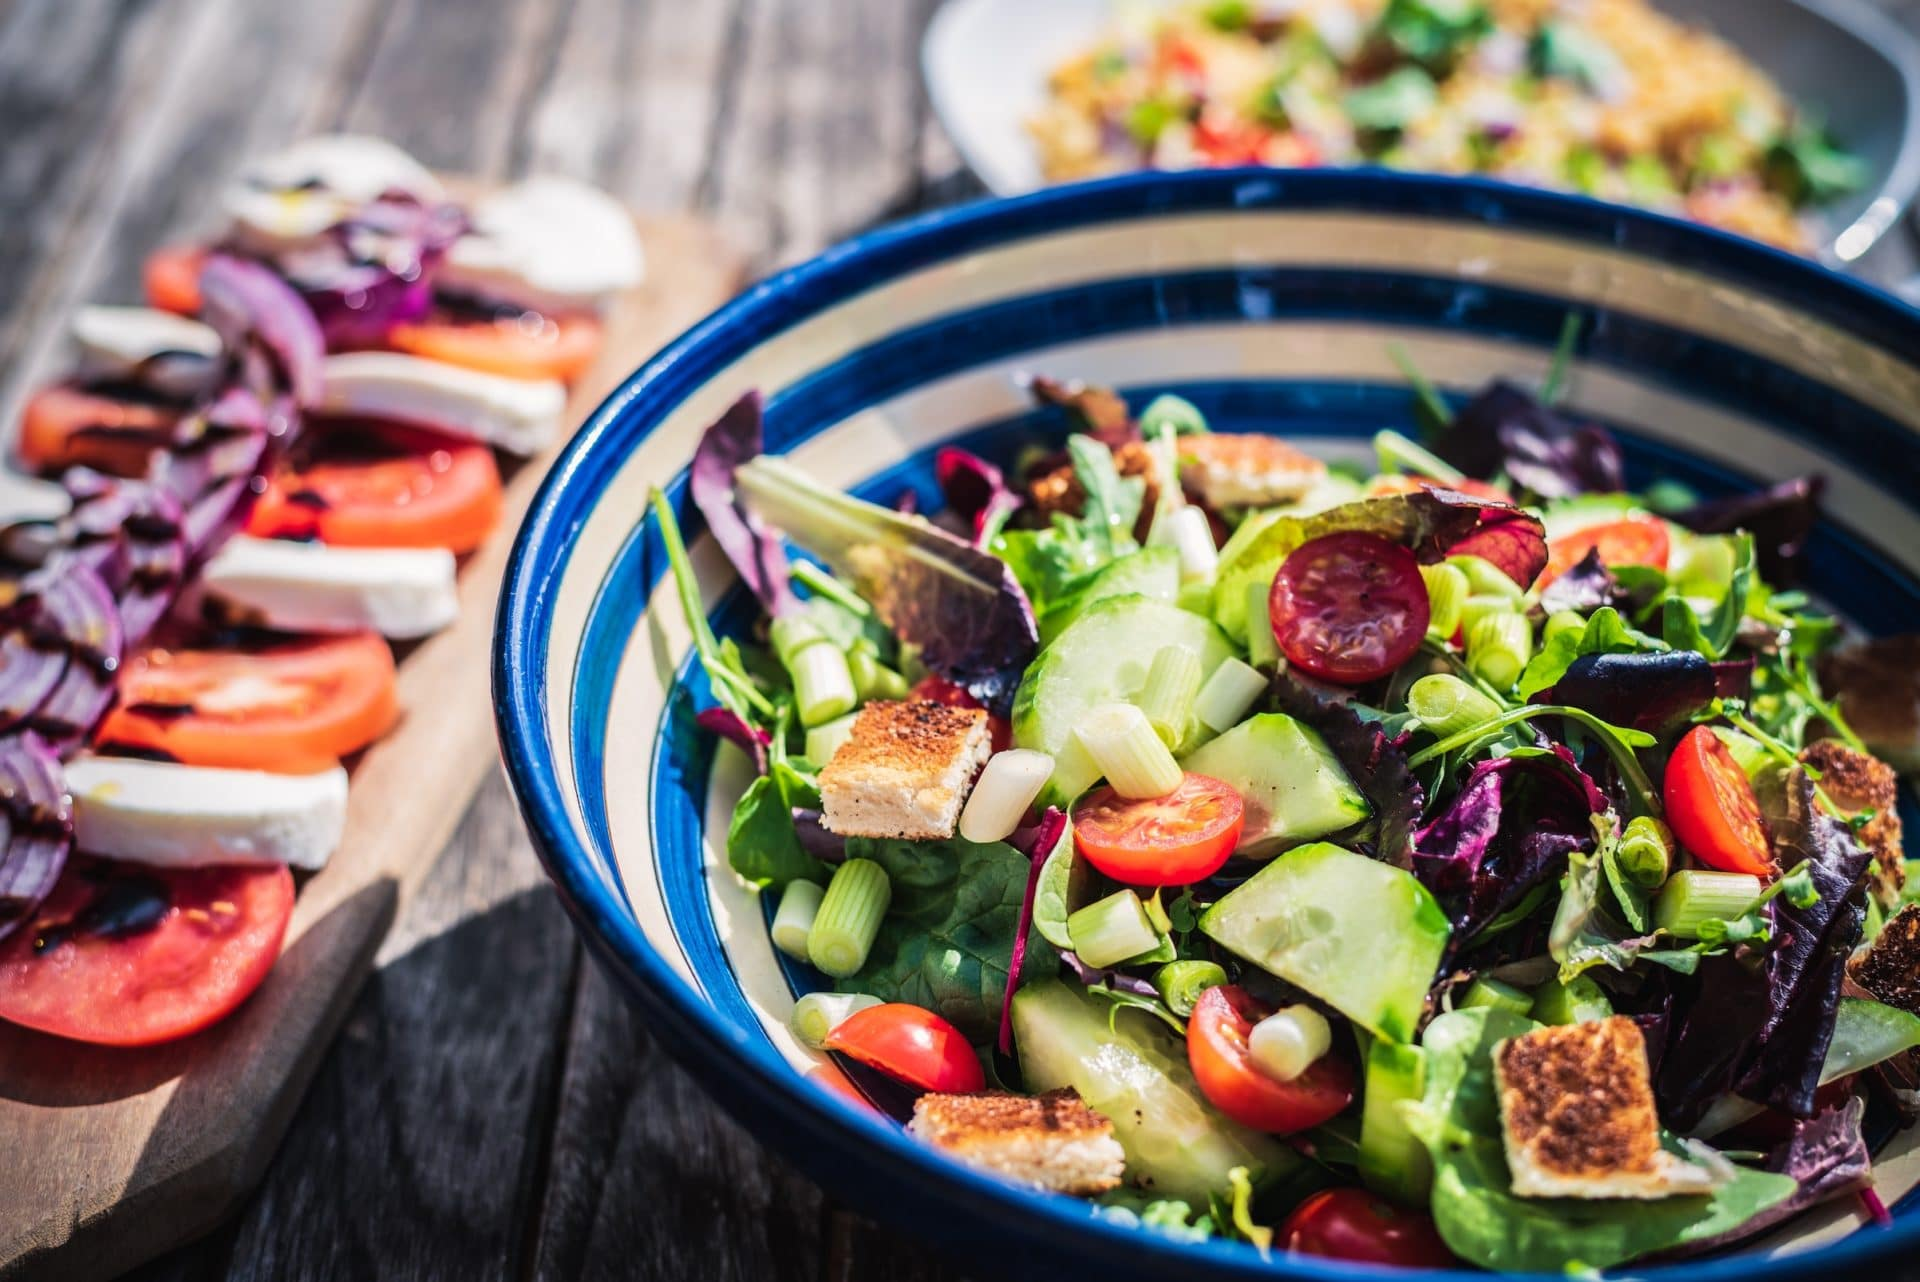 Eat Clean 5 Restaurants For Healthy Food